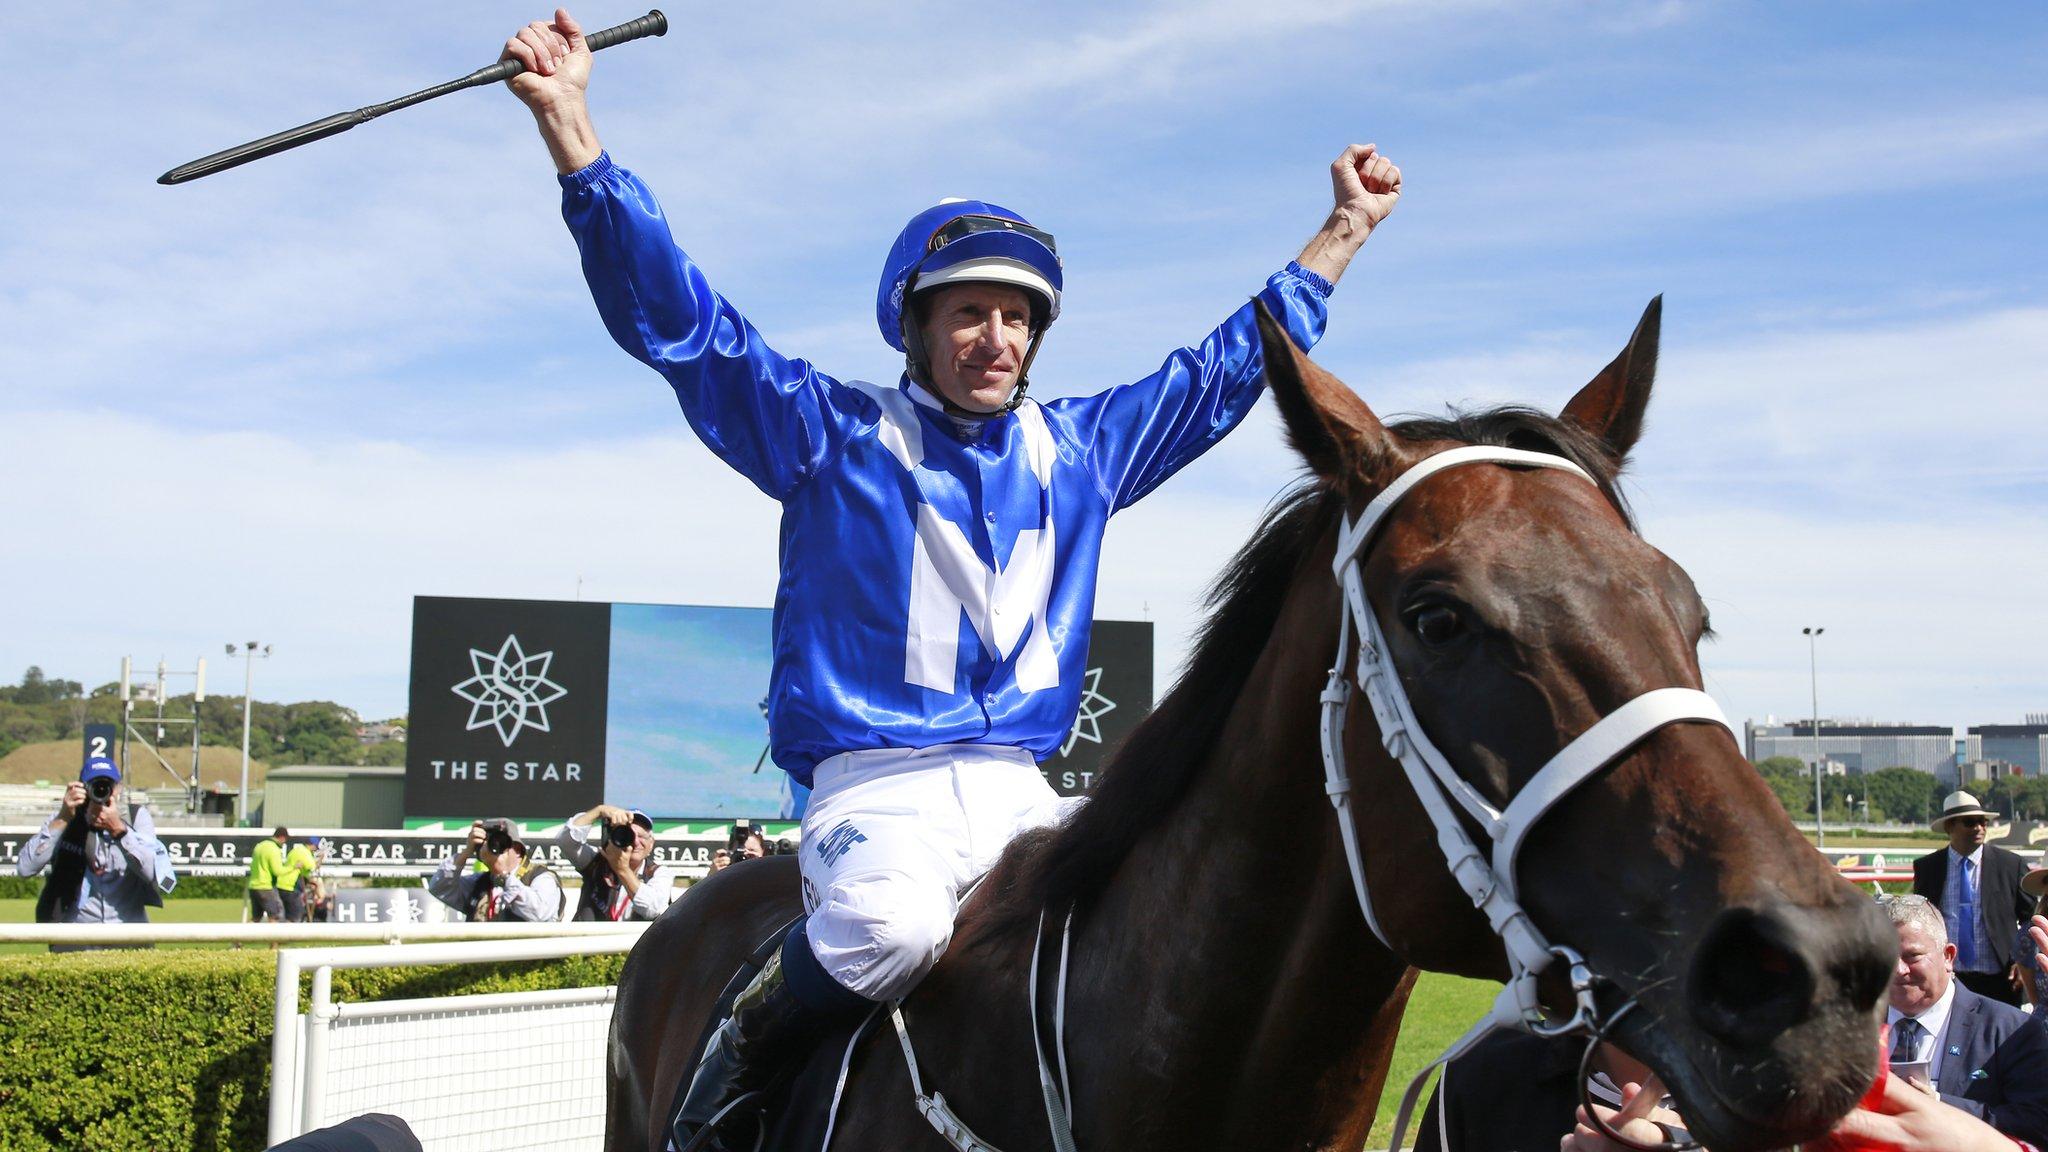 Winx: Australian mare wins 30th straight race in track record time at Randwick